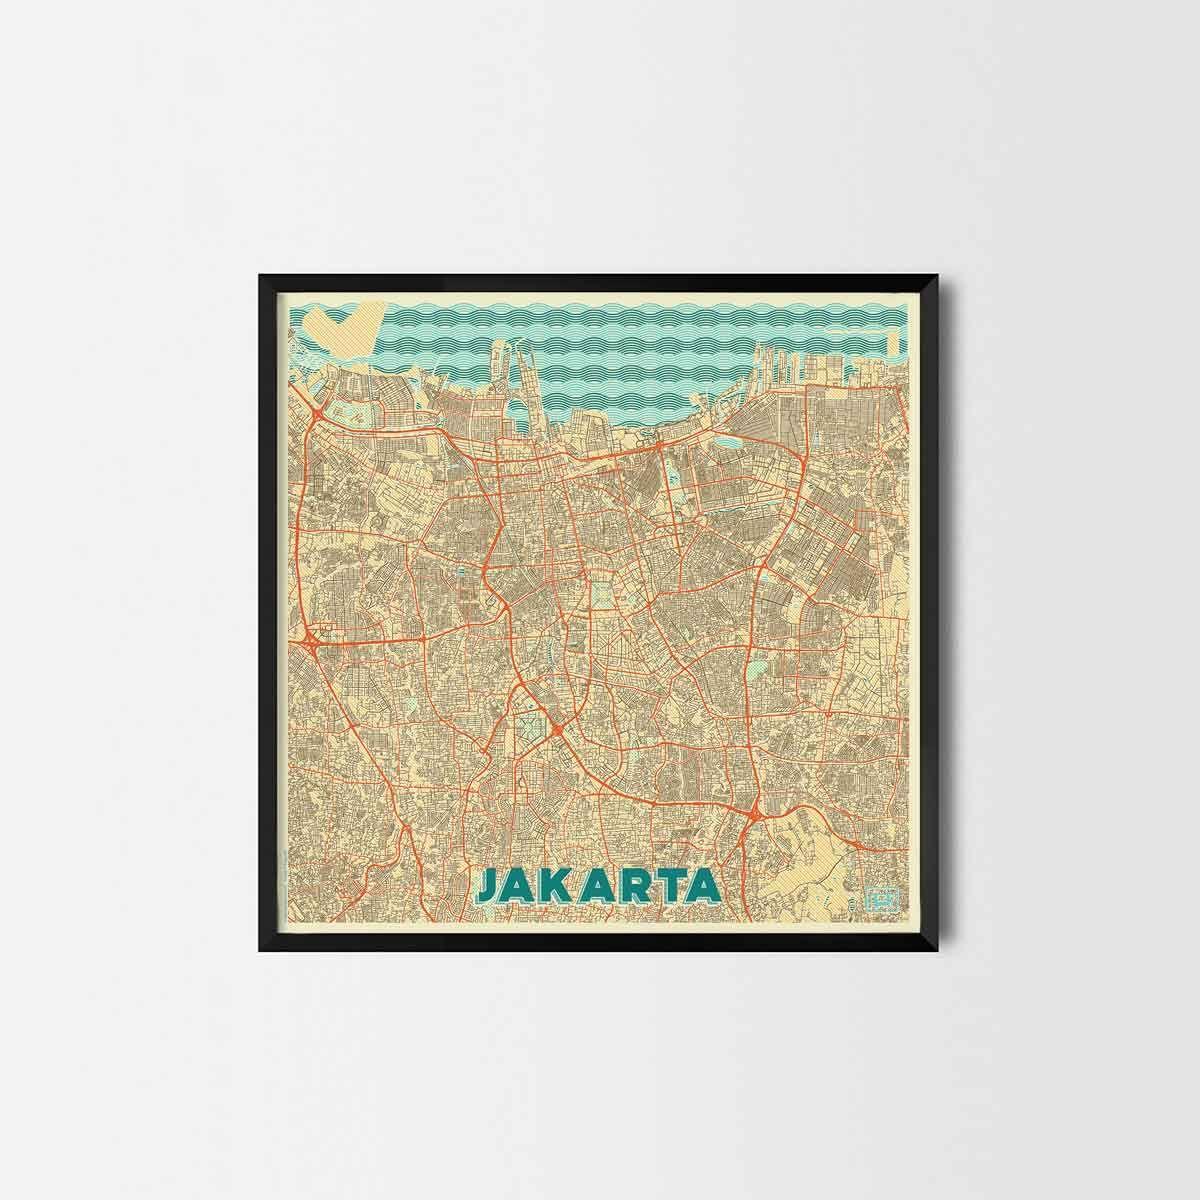 Jakarta City Prints - City Art Posters and Map Prints   Jakarta, Art ...